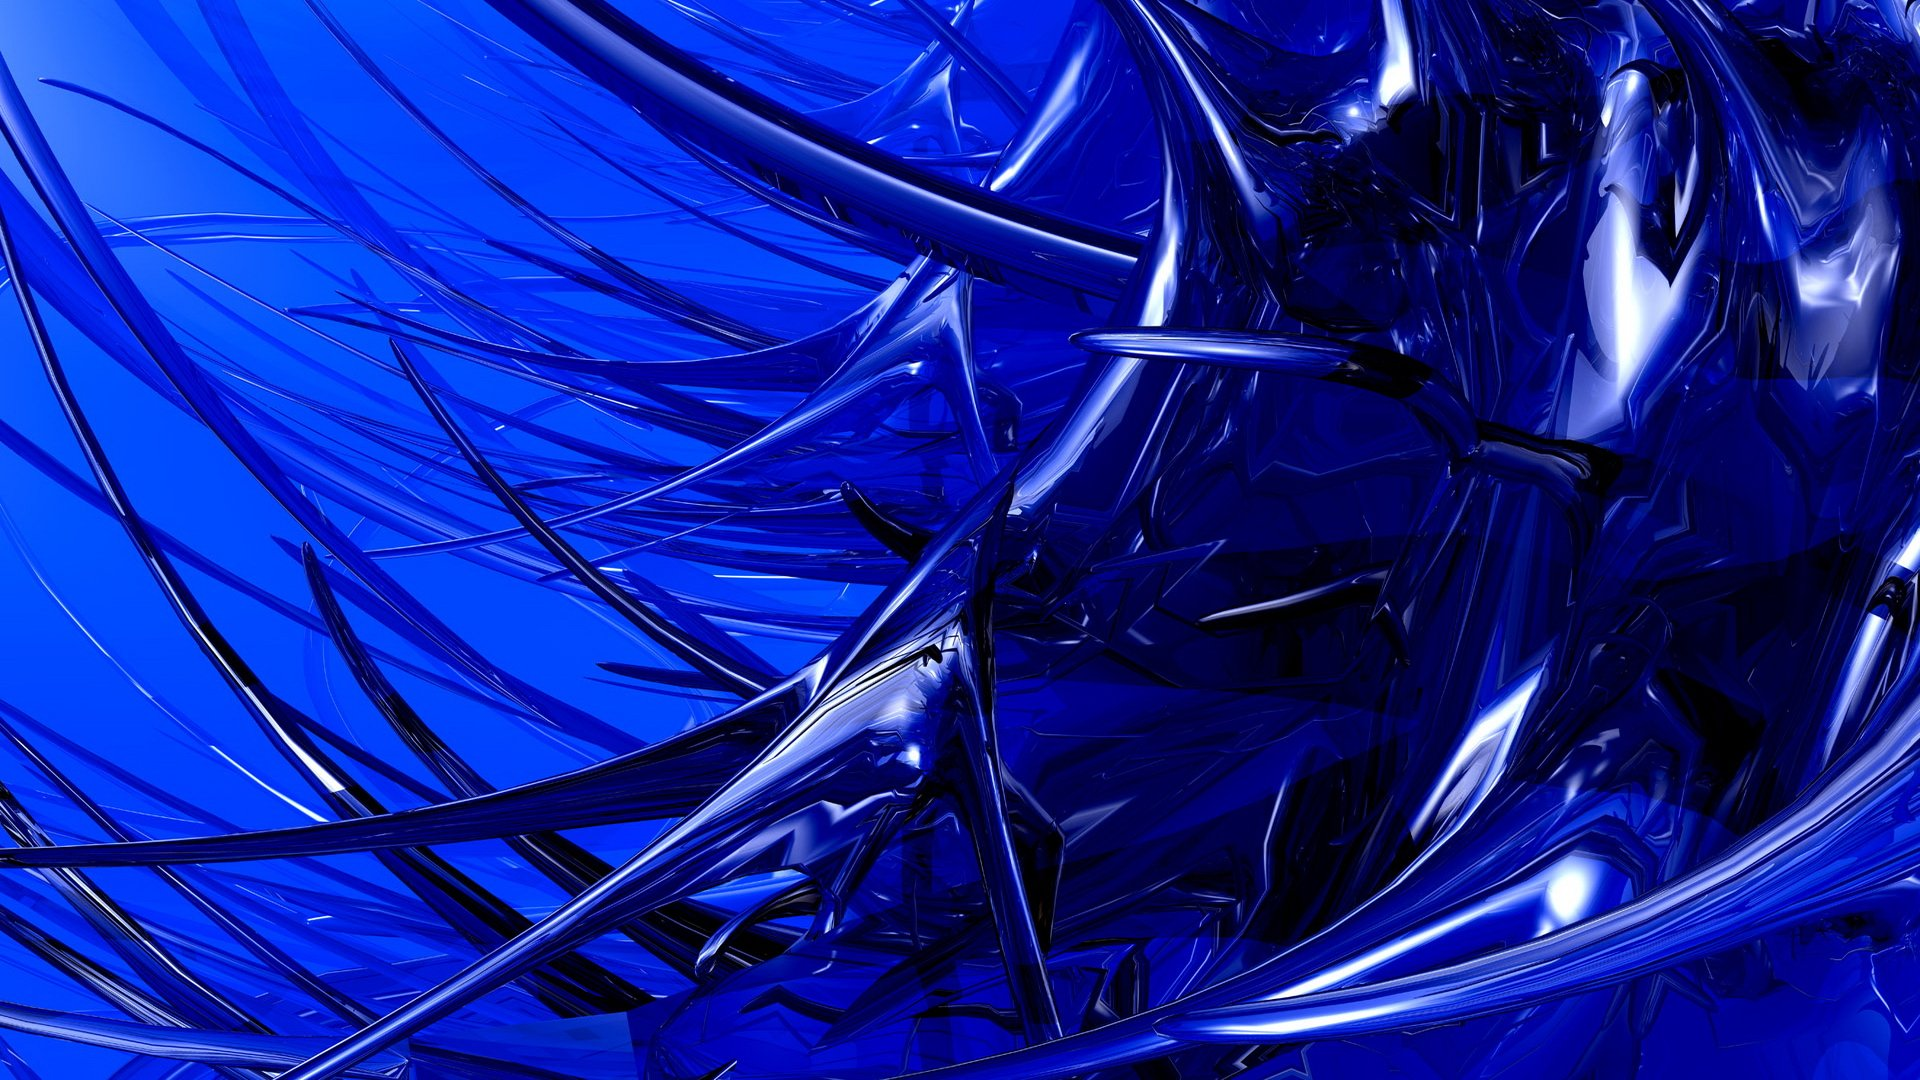 Dark Blue Abstract Hd Wallpaper